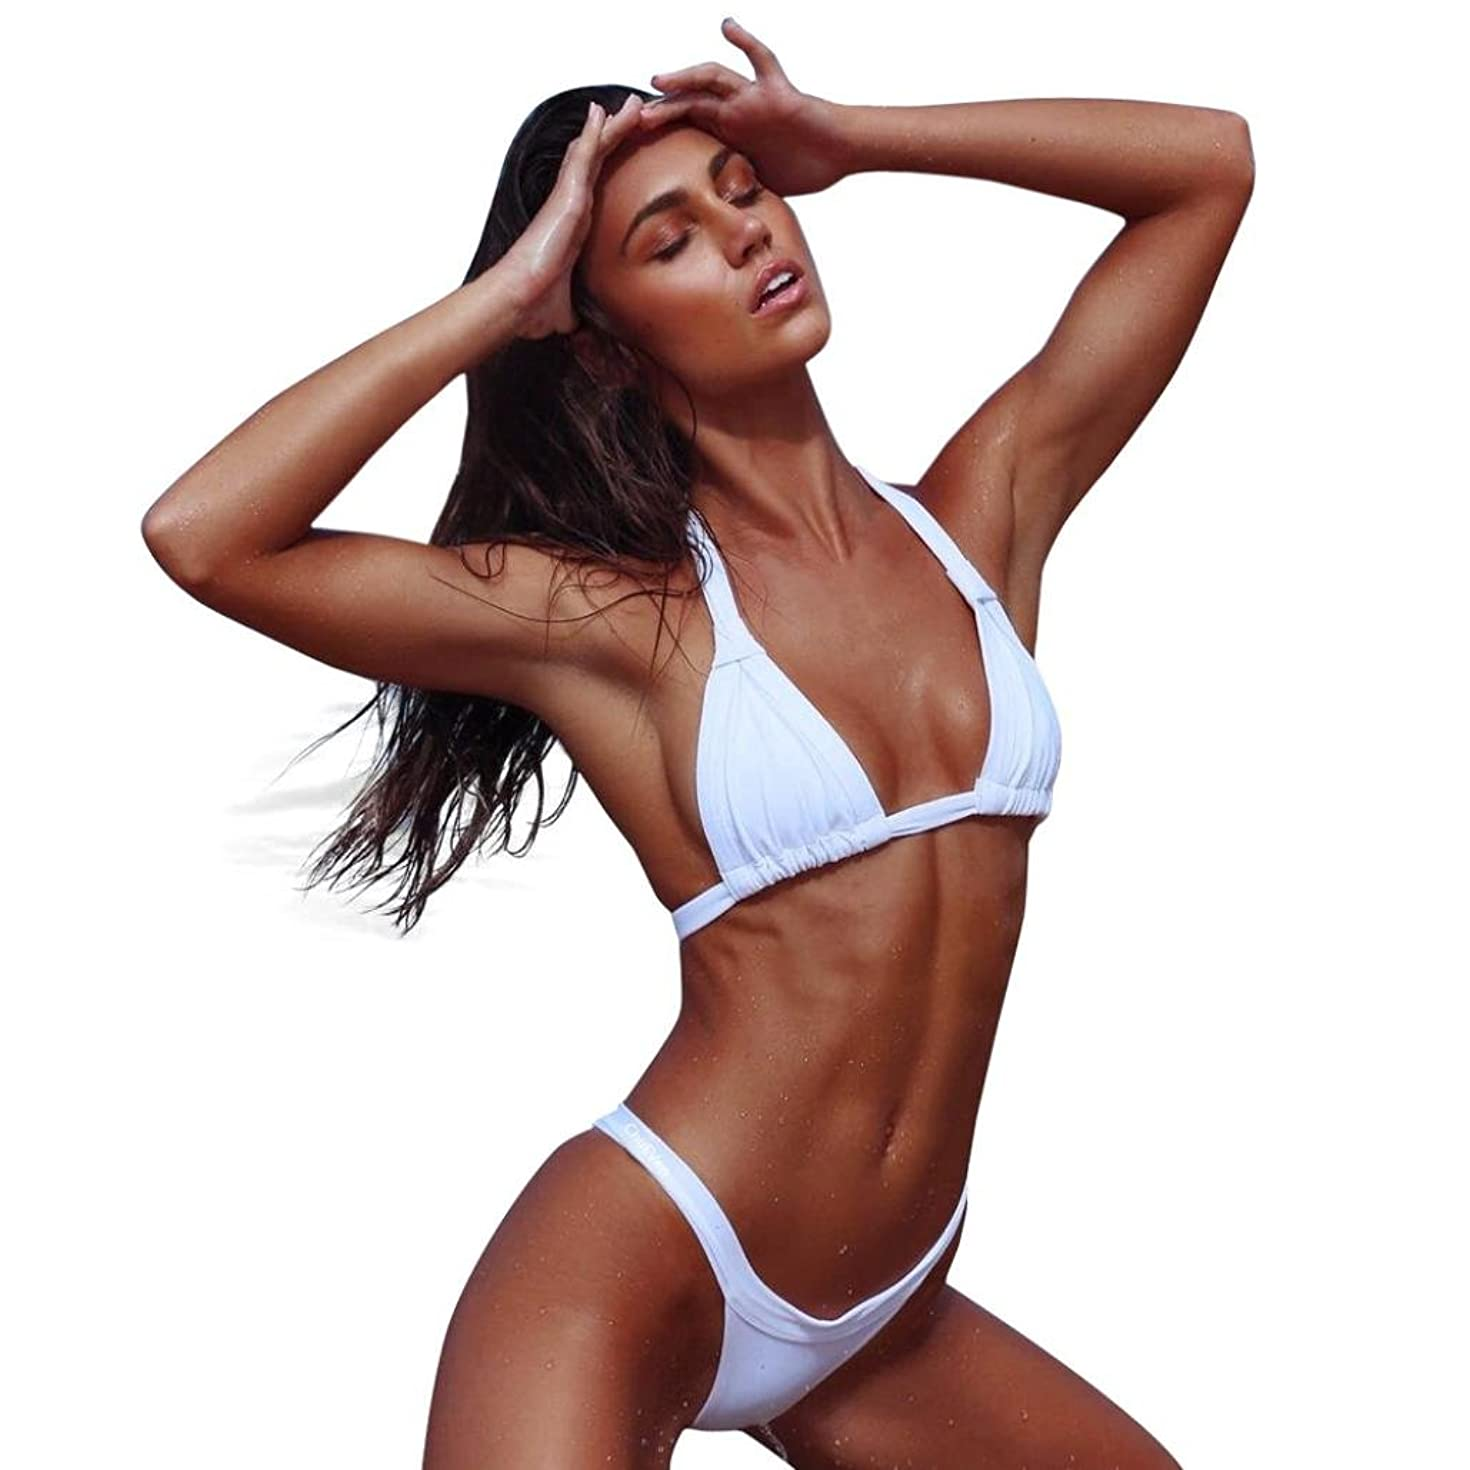 Hot Sale!!!Women's Swimwear,Jushye Sexy Solid Halter Two Pieces Bikini Set Push-Up Padded Swimsuit Bathing Beachwear (White, L)